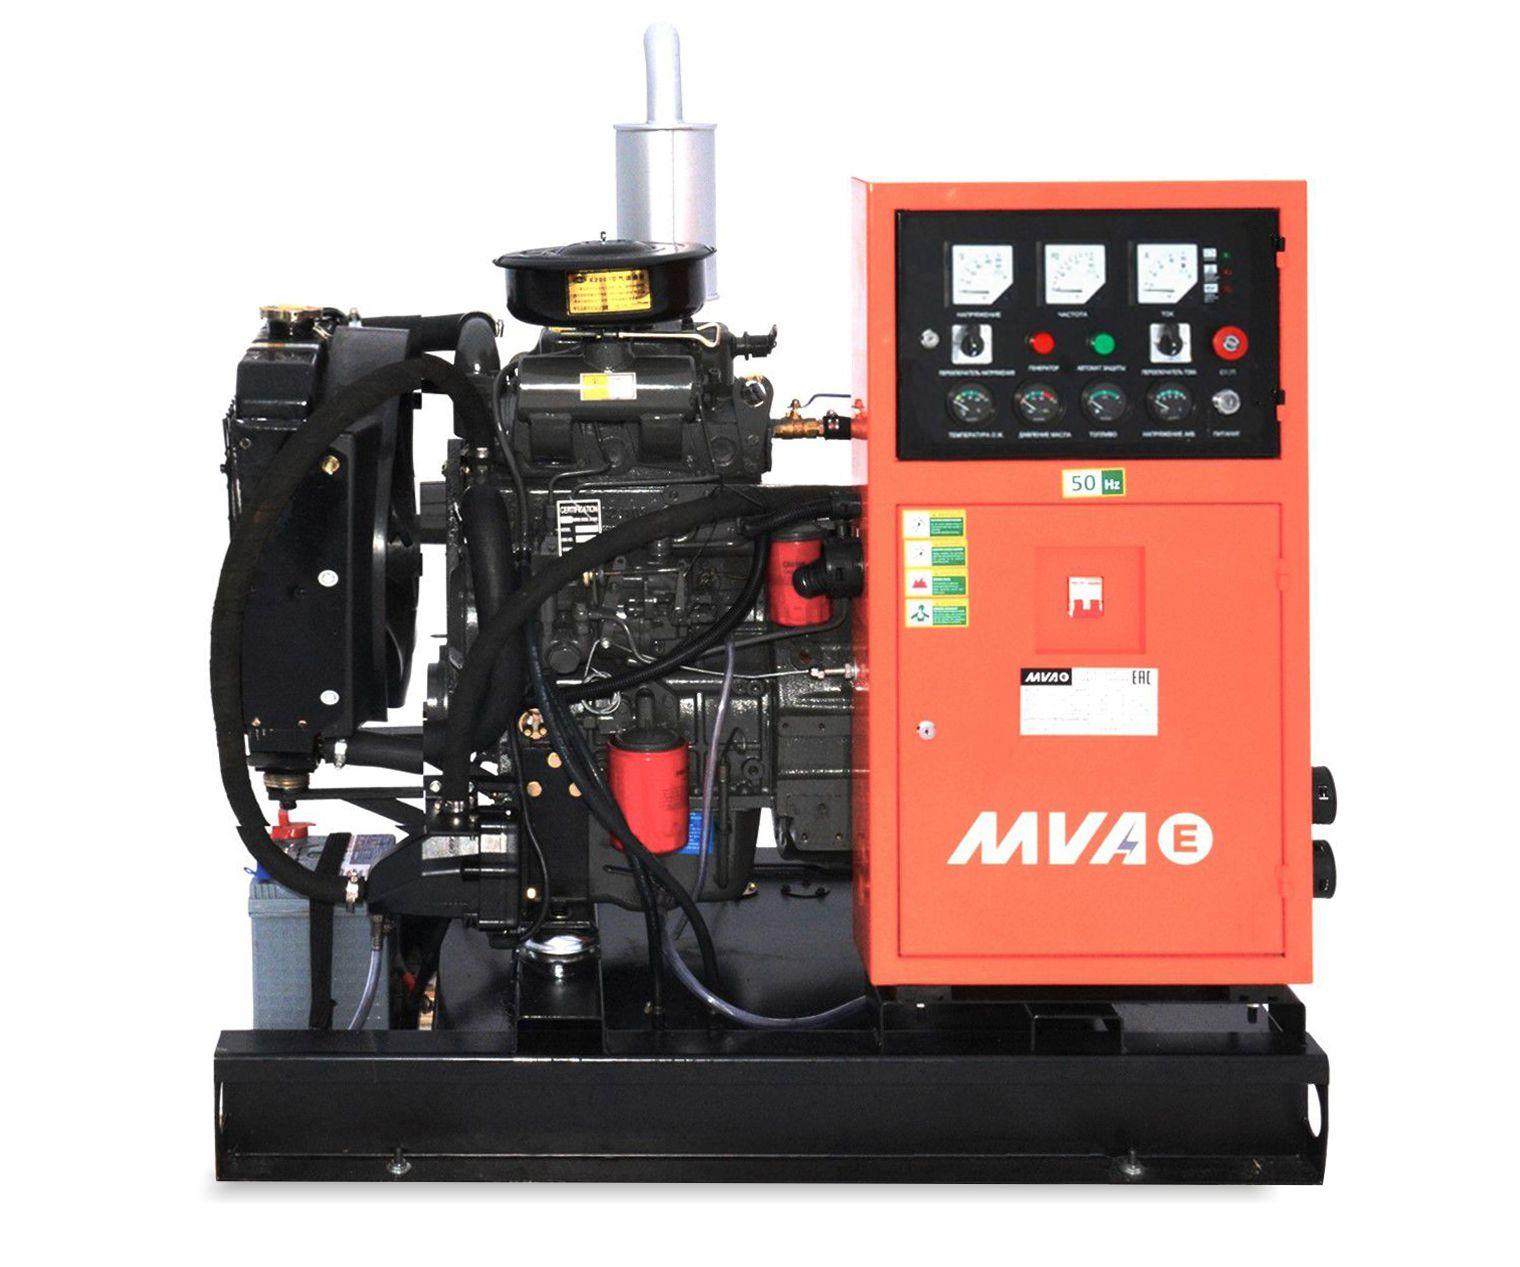 Внешний вид MVAE АД-10-230-АР на раме с АВР